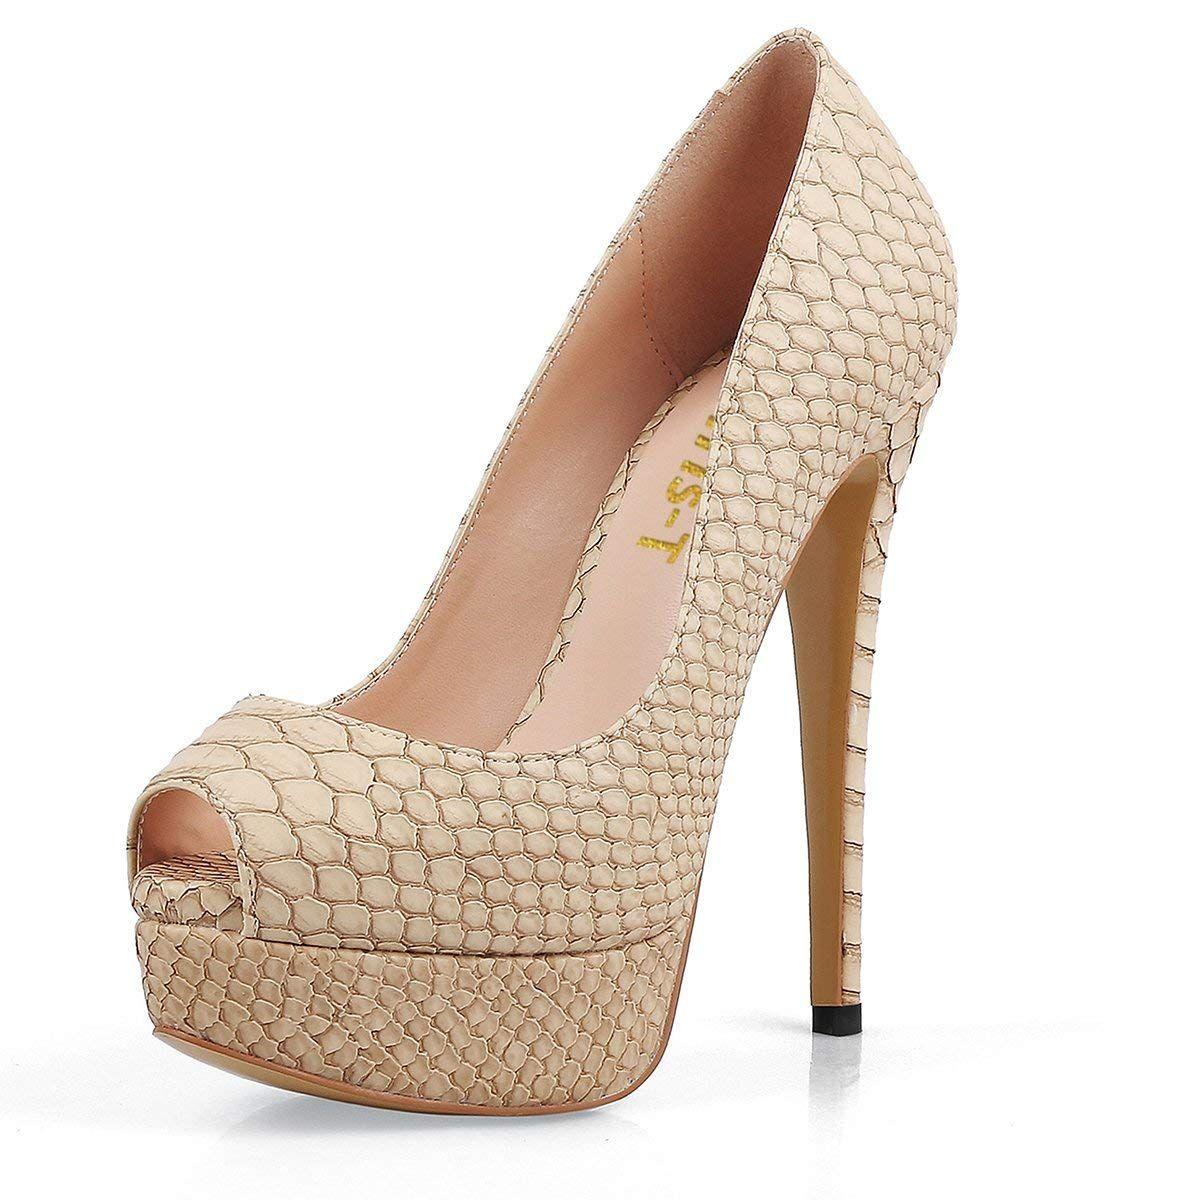 a85ed2c82c86 Chris-T Womens Sexy Slip On High Heels Peep Toe Platform Pumps Stiletto  Dress Wedding Shoes